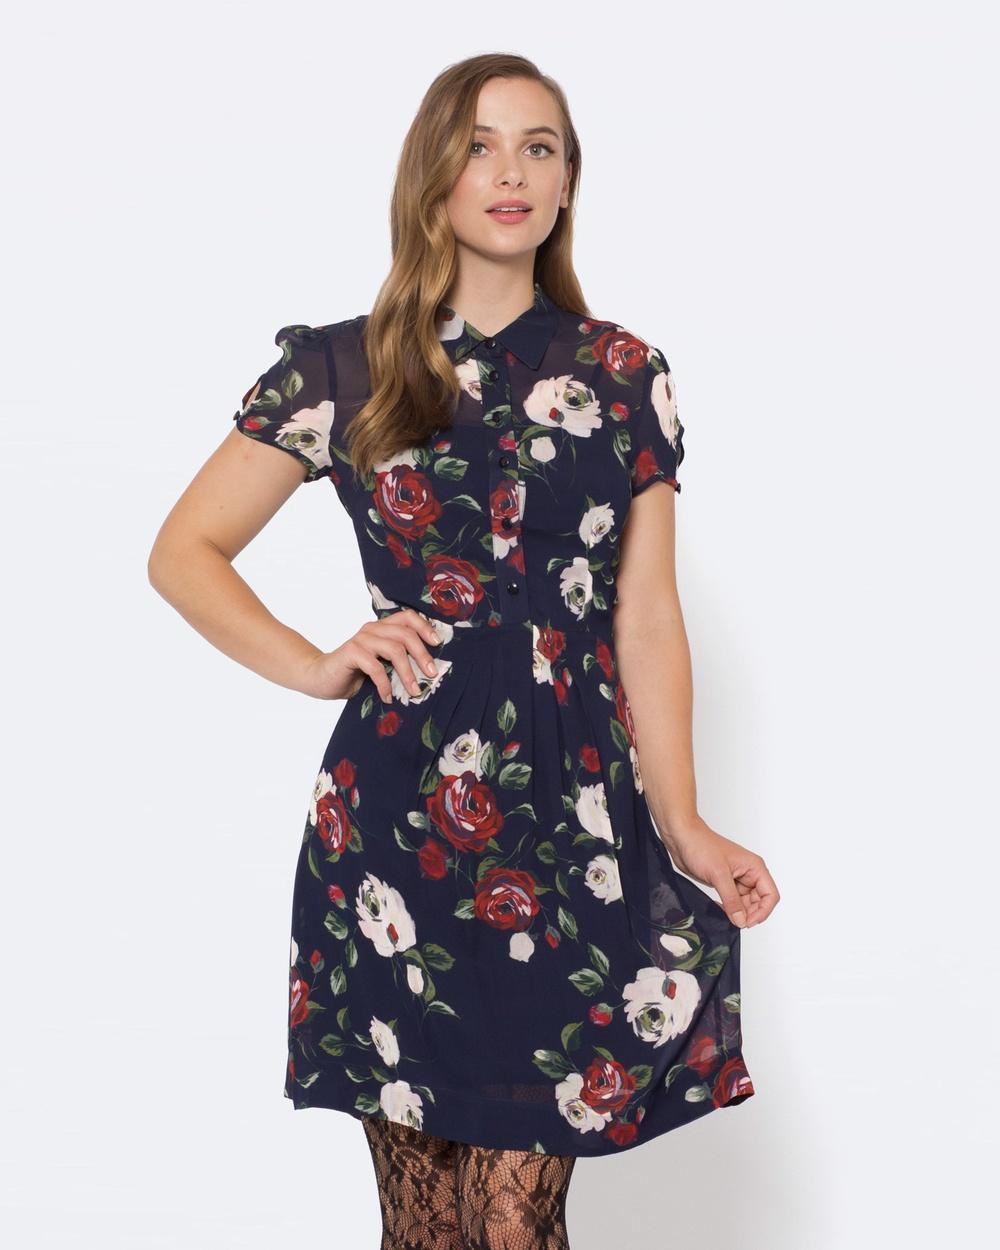 Alannah Hill Wild Rose Dress Dresses Navy Wild Rose Dress